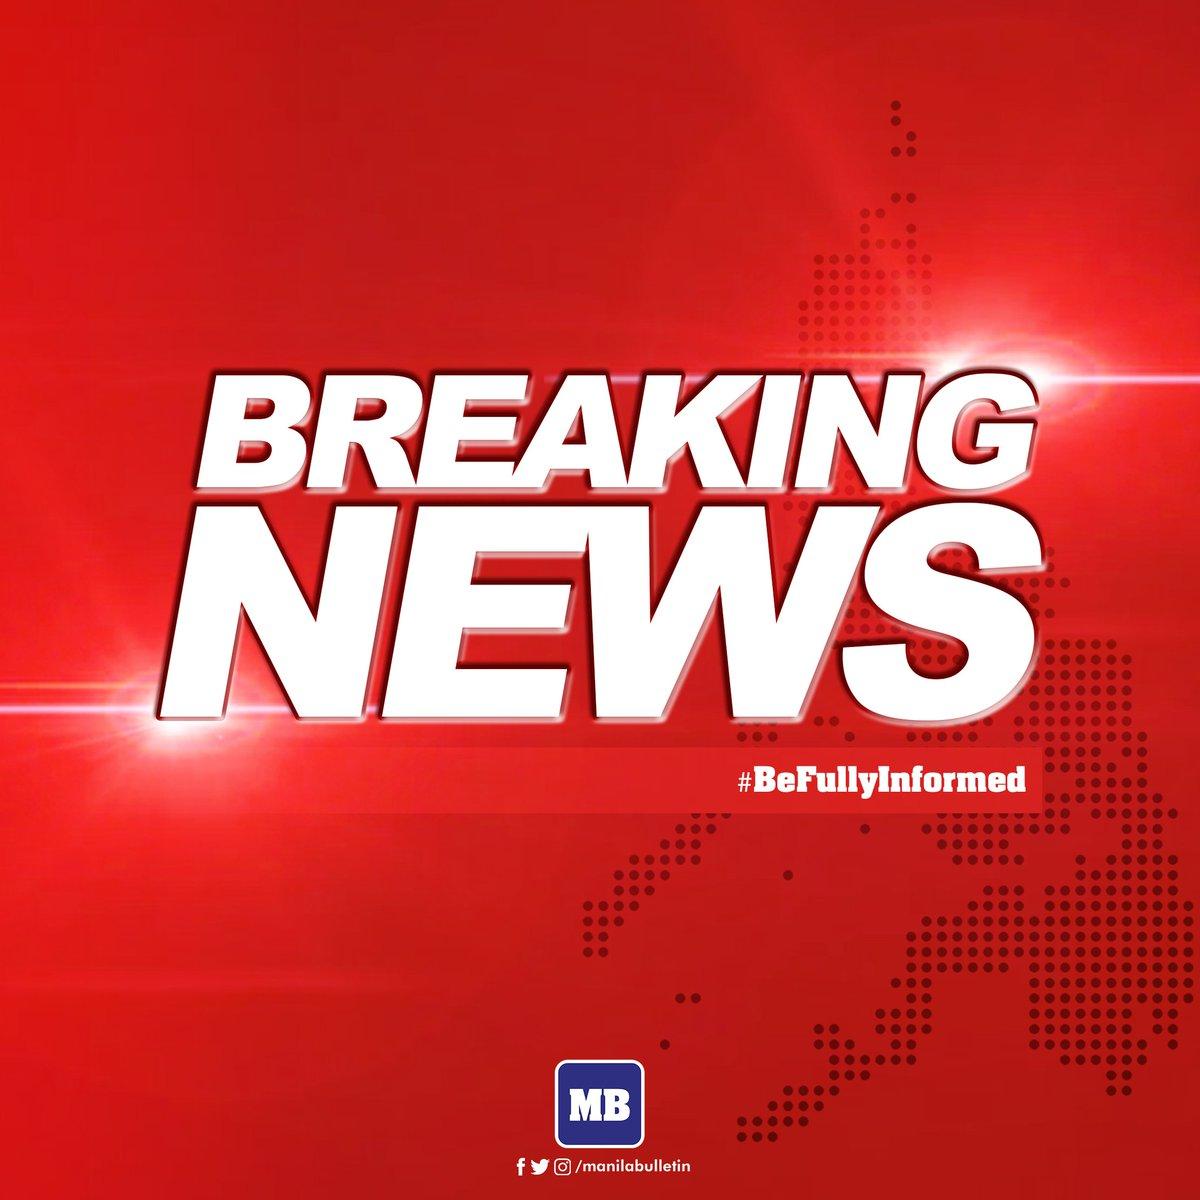 breaking news cover manila - HD1200×1200